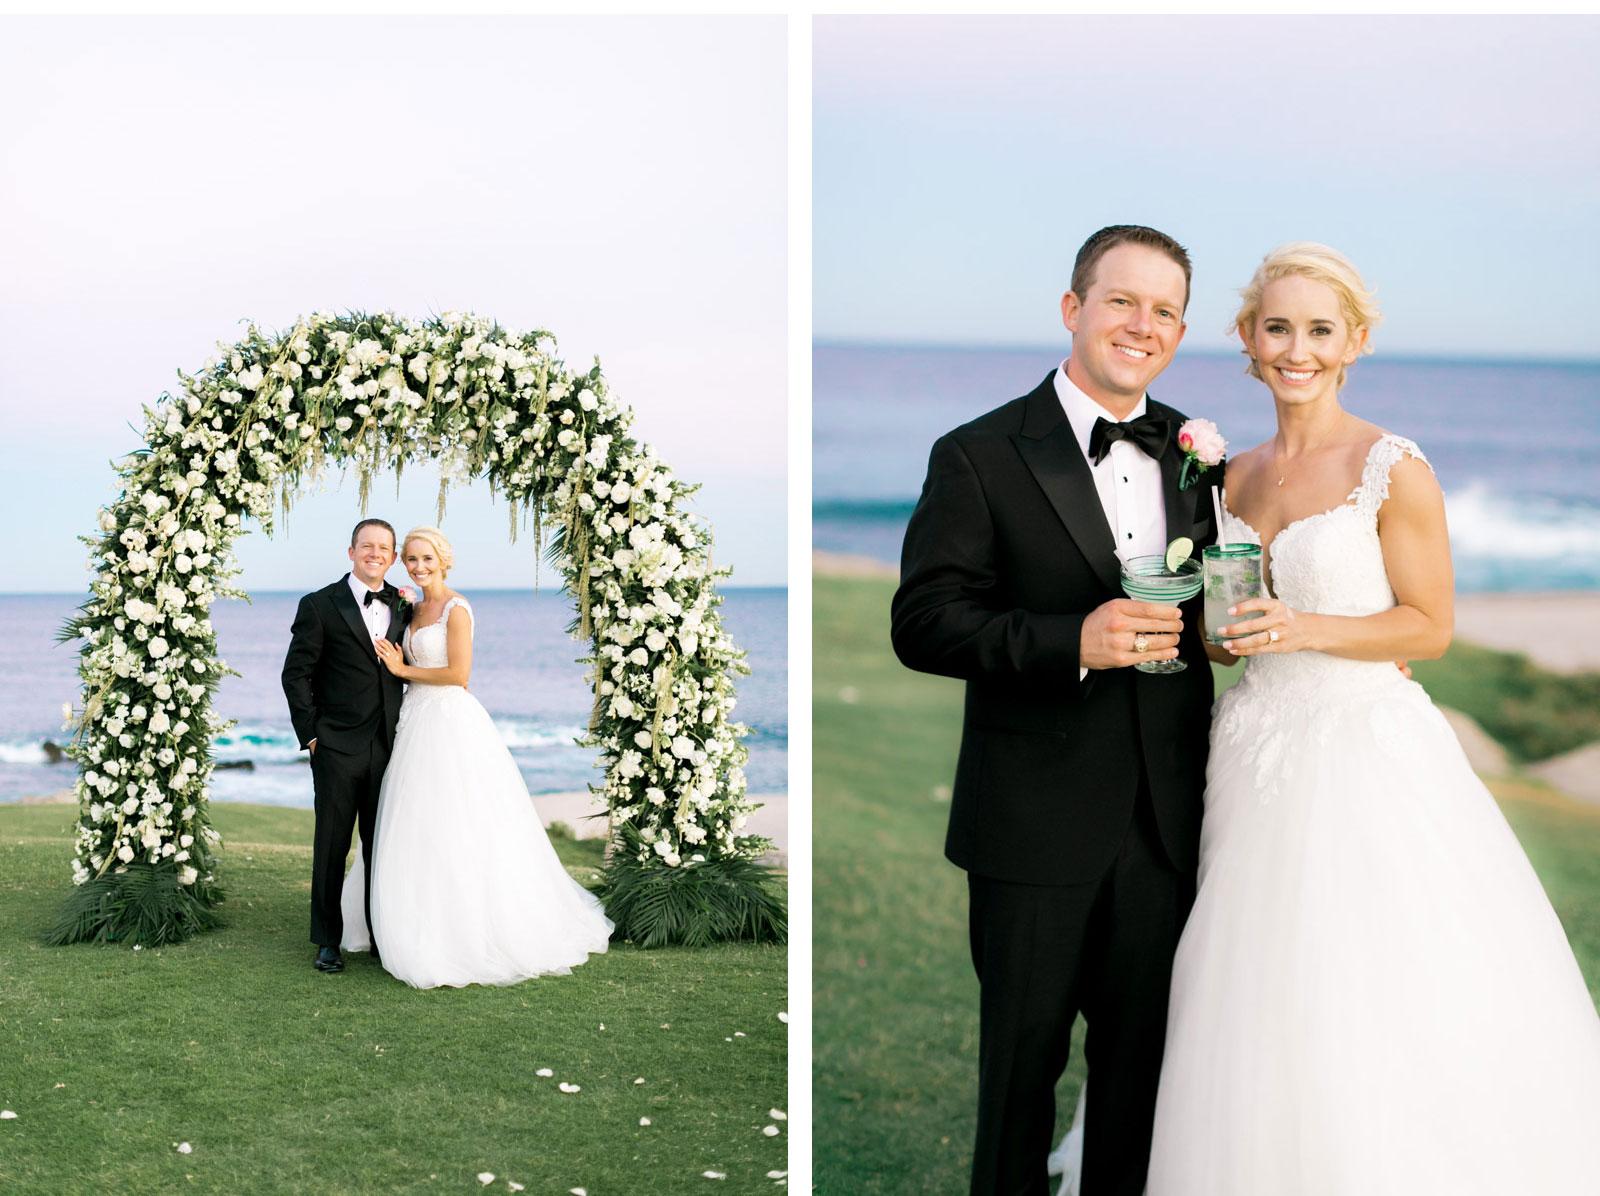 Hawaii-Destination-Wedding-Natalie-Schutt-Photography-Style-Me-Pretty_10.jpg